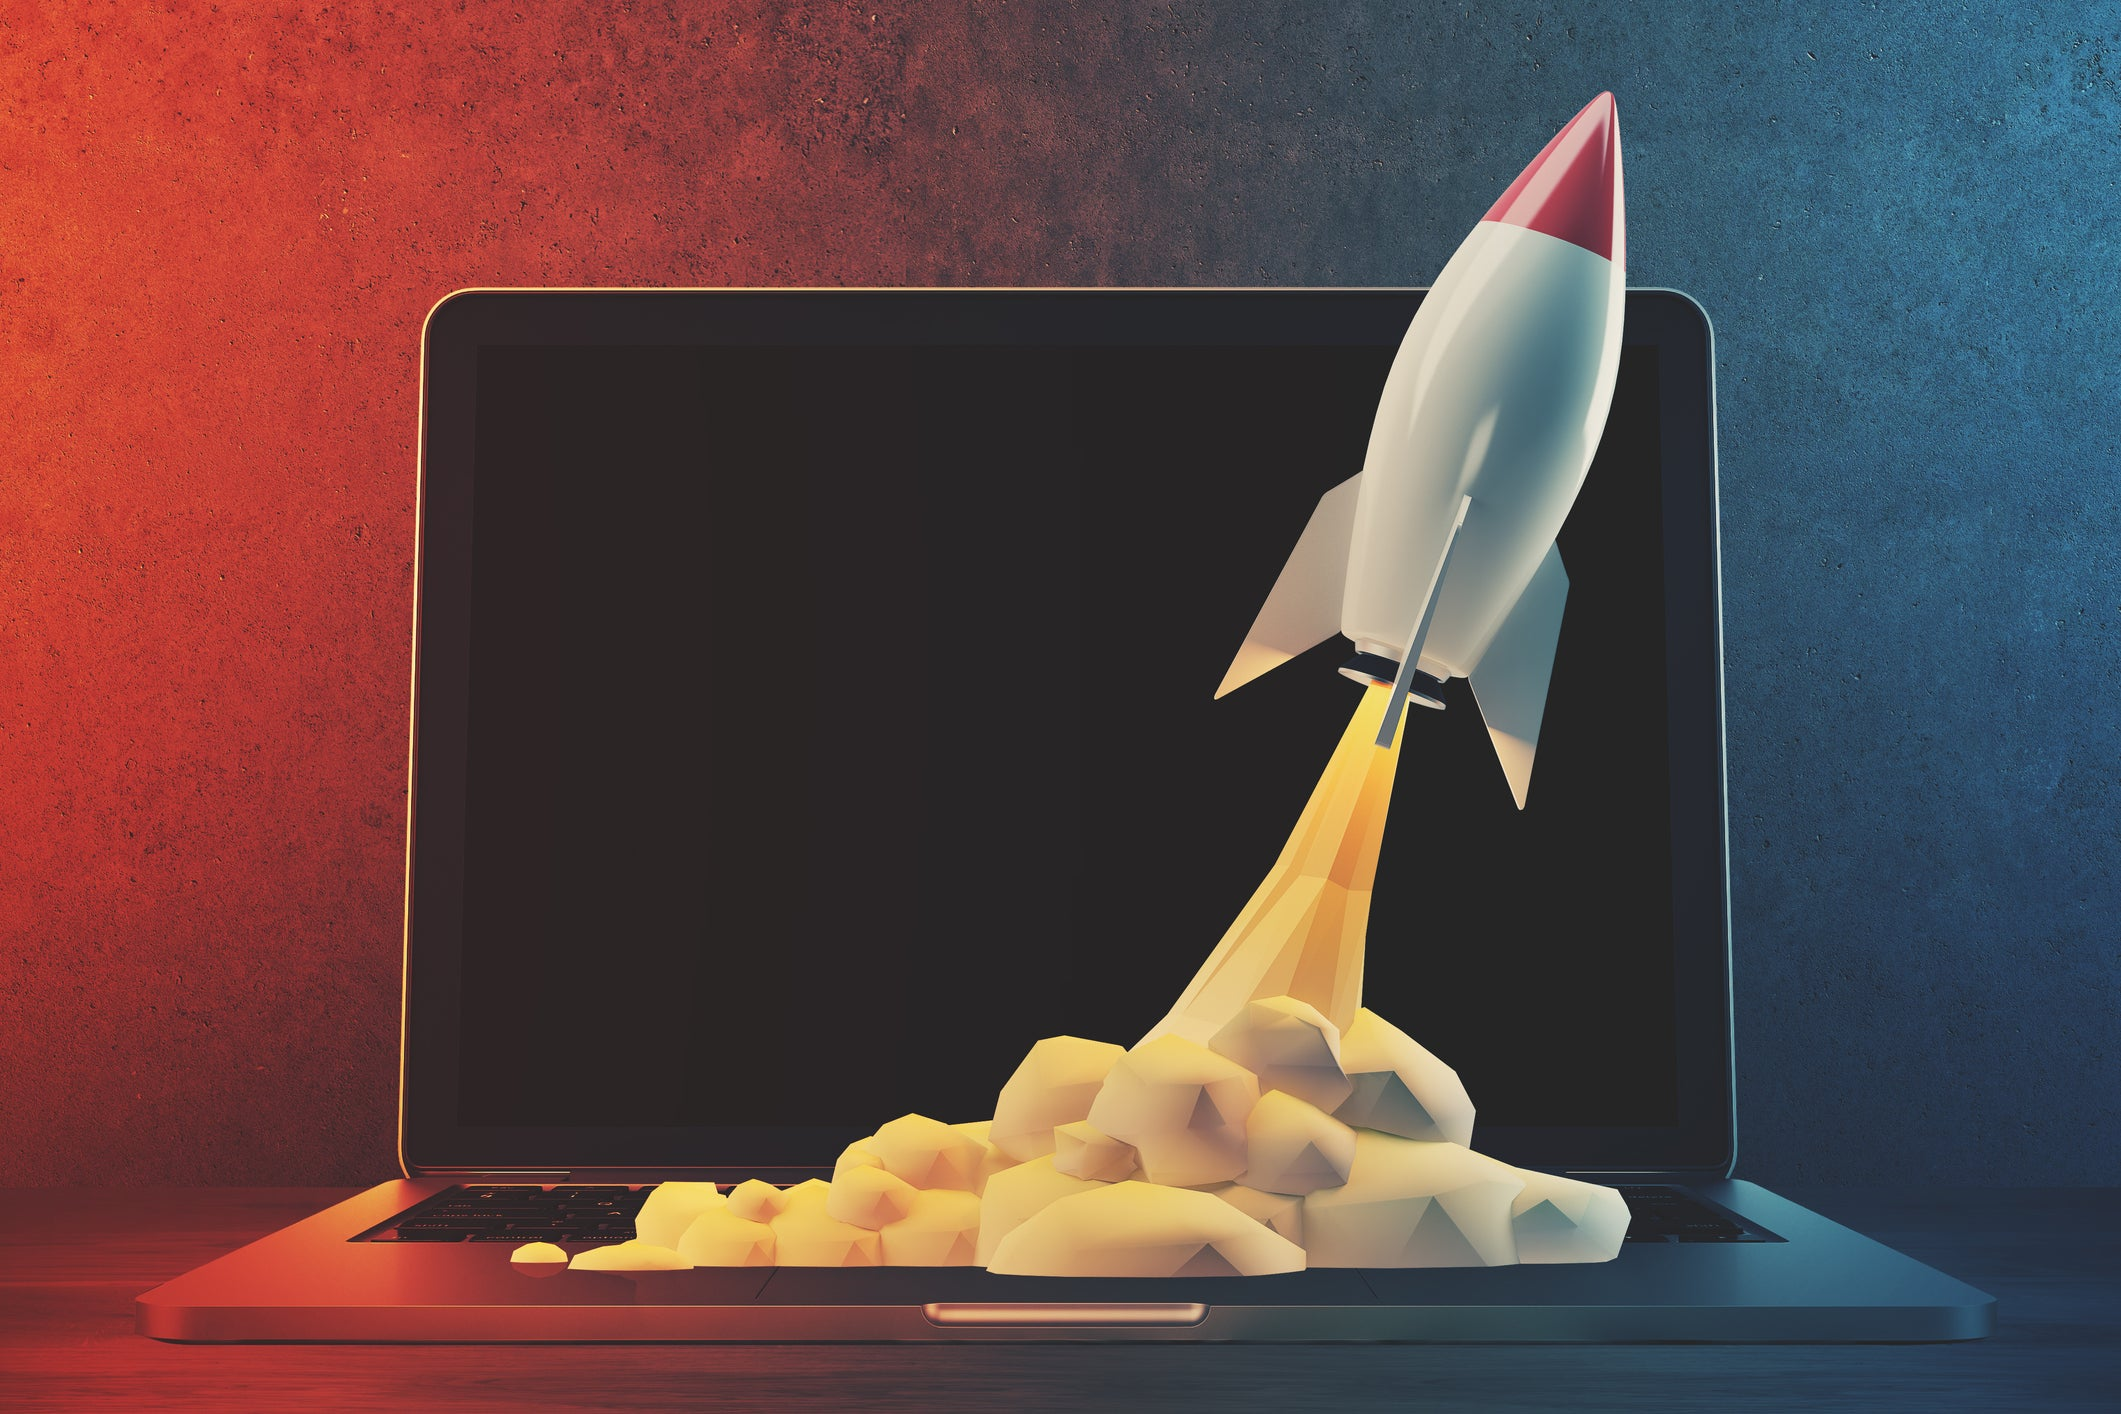 Why Atlassian Stock Jumped 31% Friday Morning